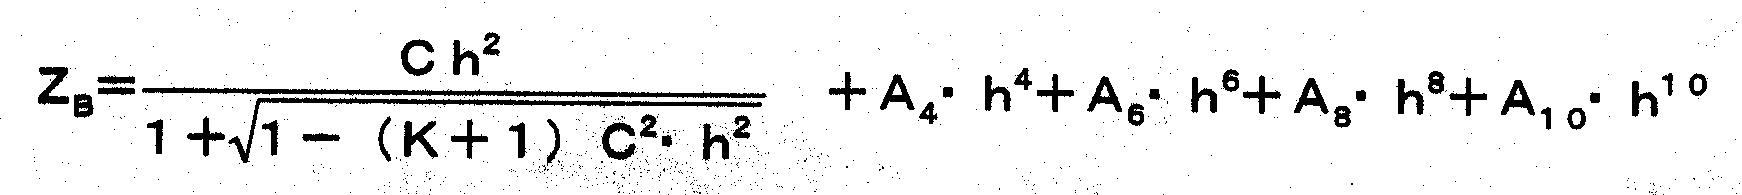 Figure 112003000861169-pat00012